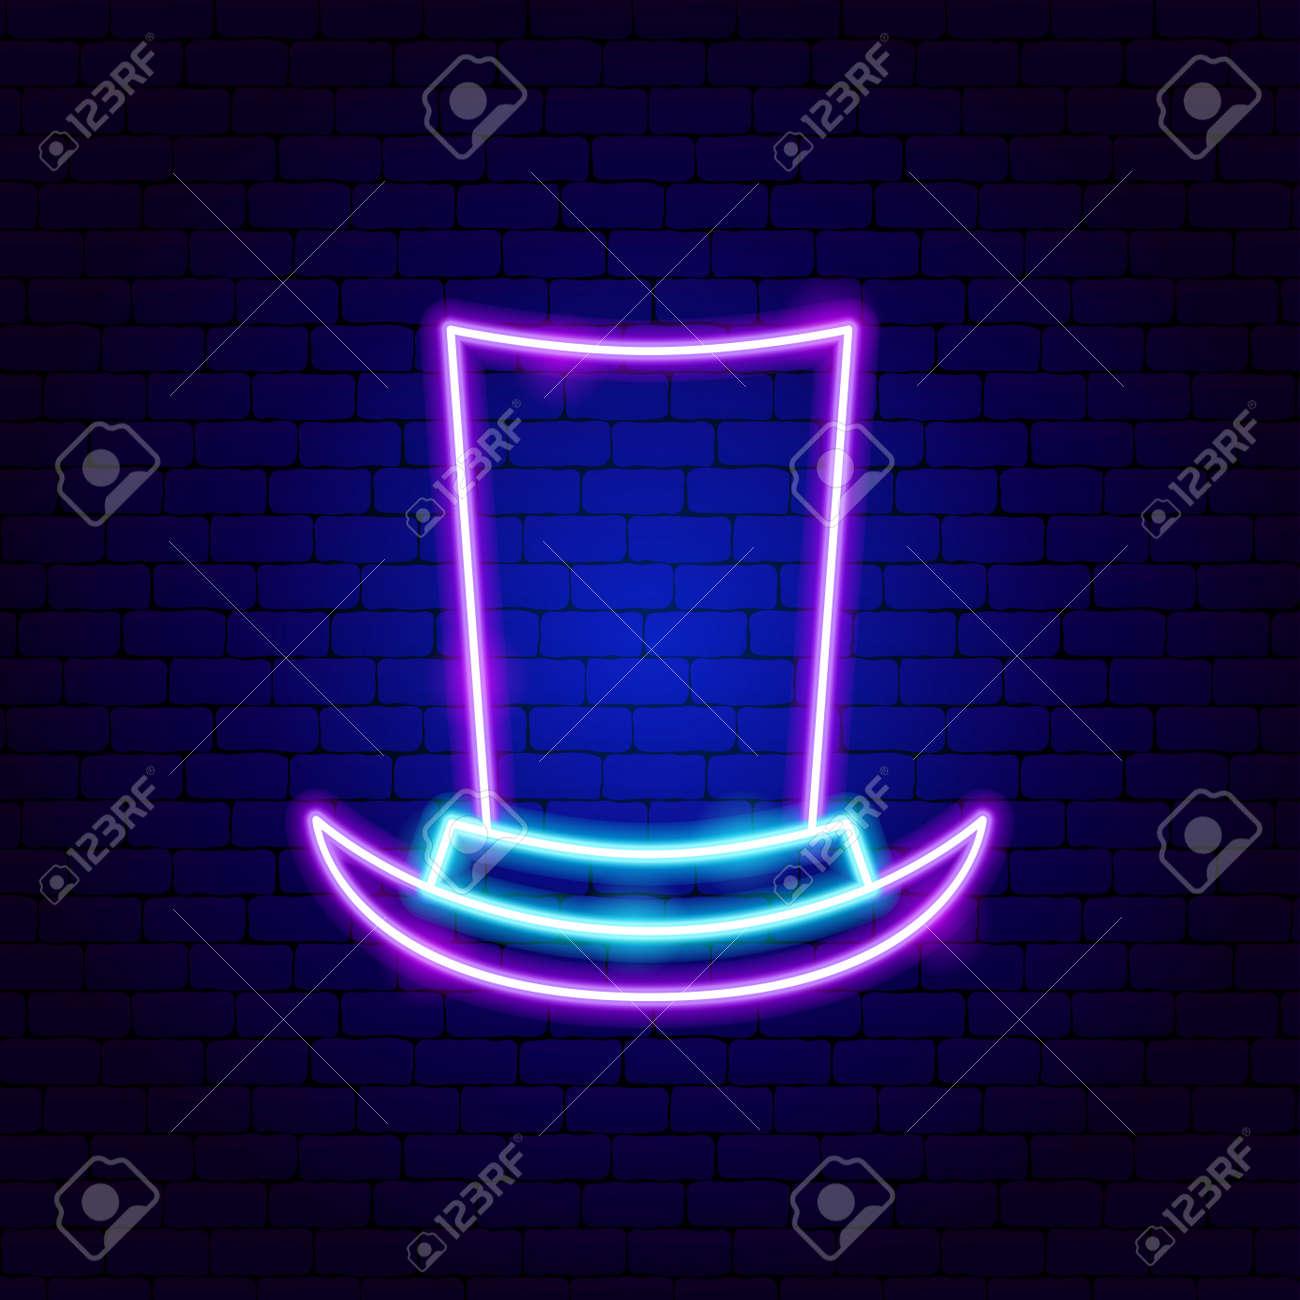 Cylinder Hat Neon Sign - 168963334